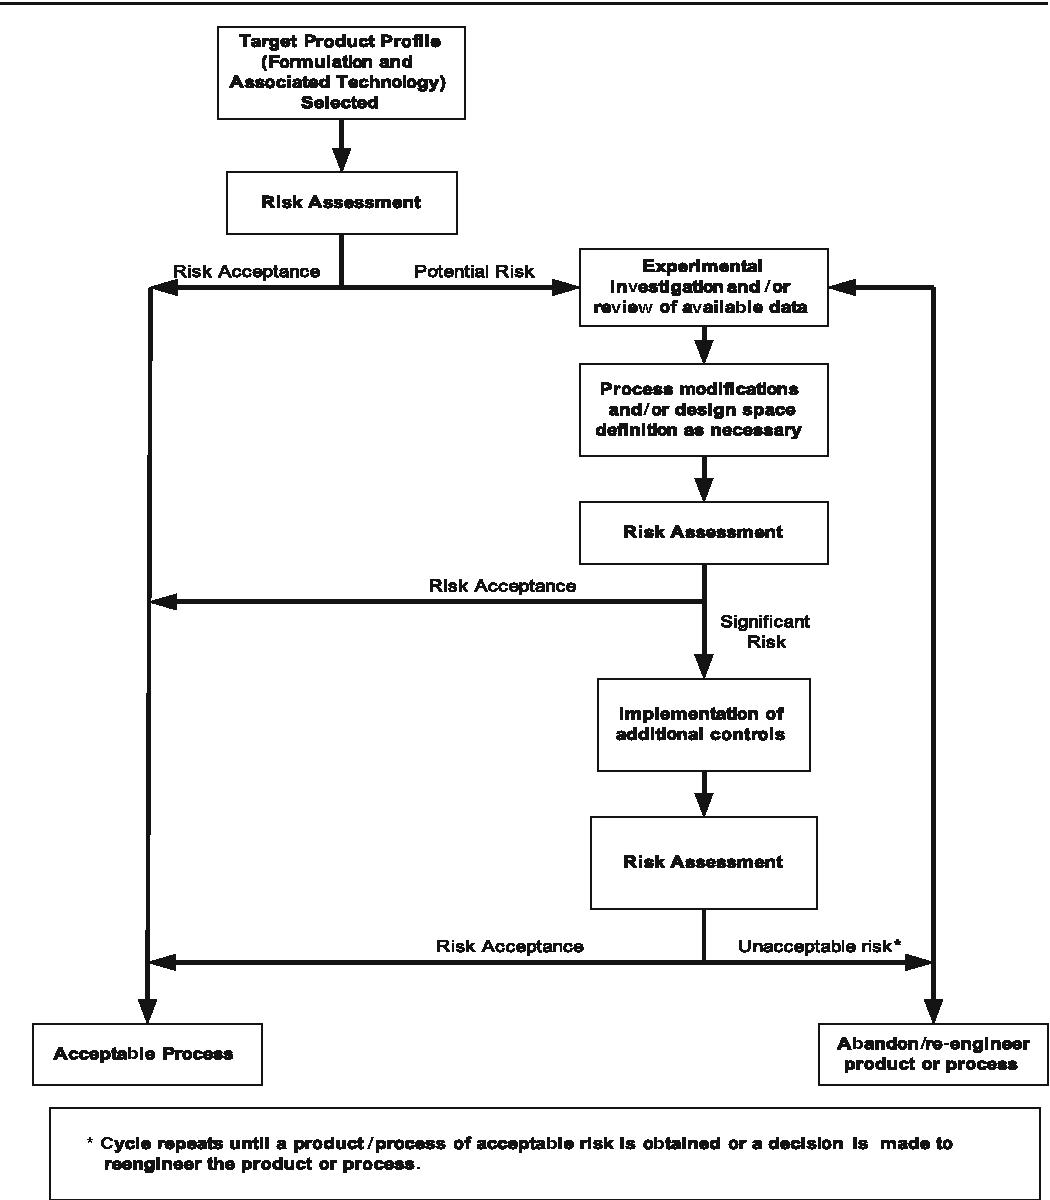 1 flow diagram for risk management during pharmaceutical development